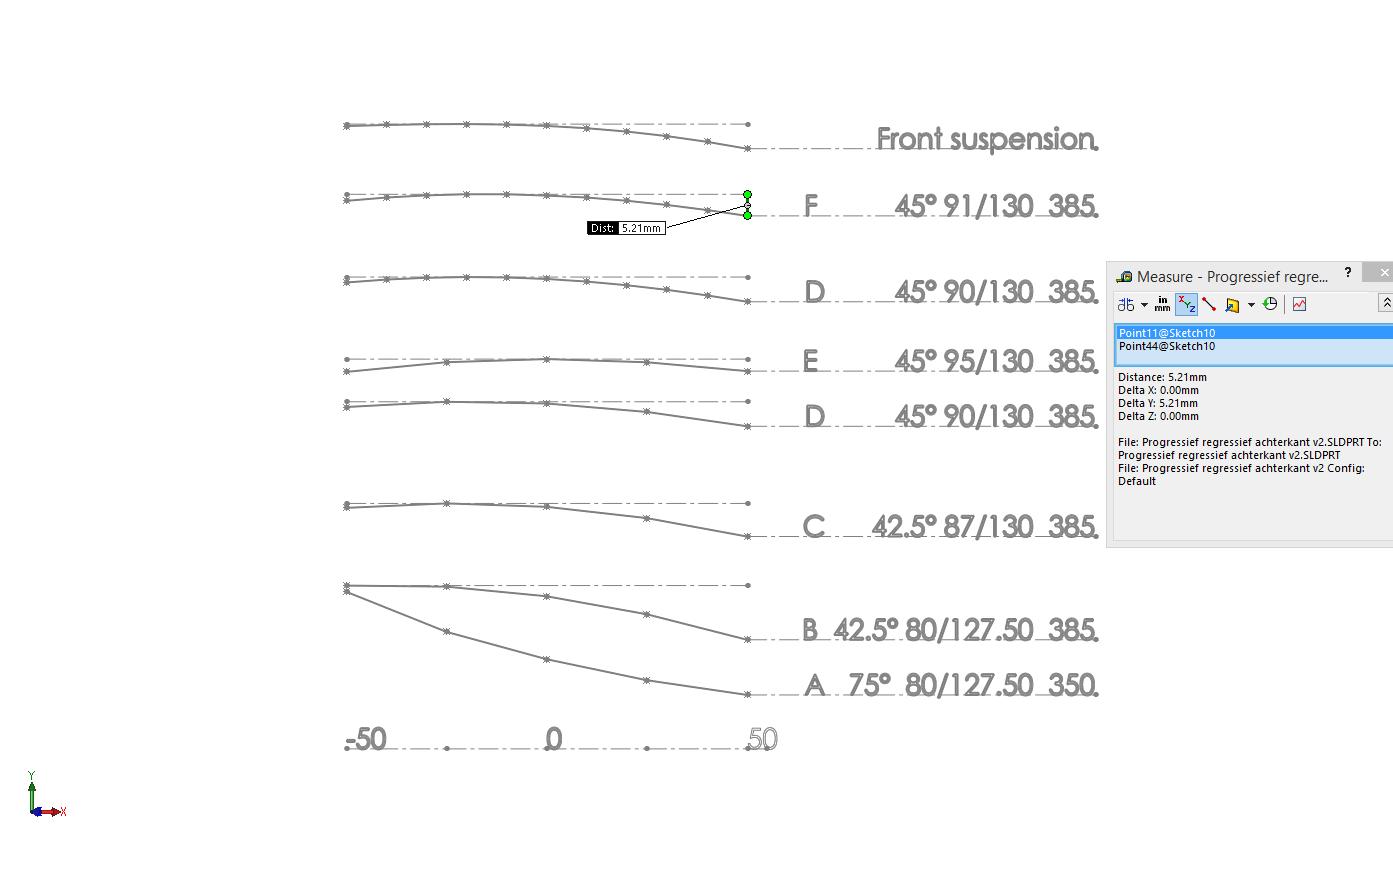 Bellcrank graph rear